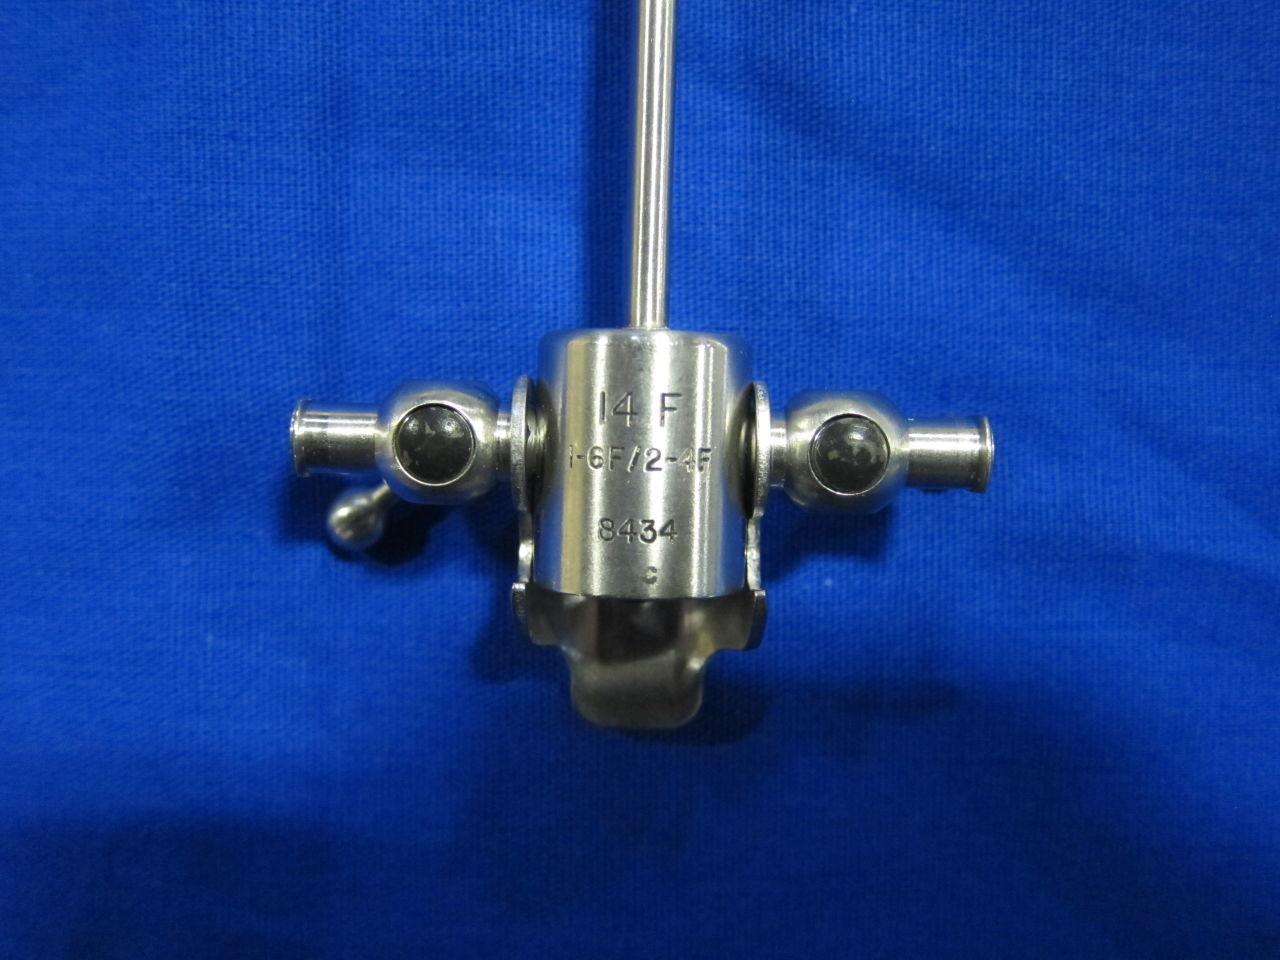 WAPPLER 14F  1-6F/2-4F   8434 Resectoscope w/ Sheath